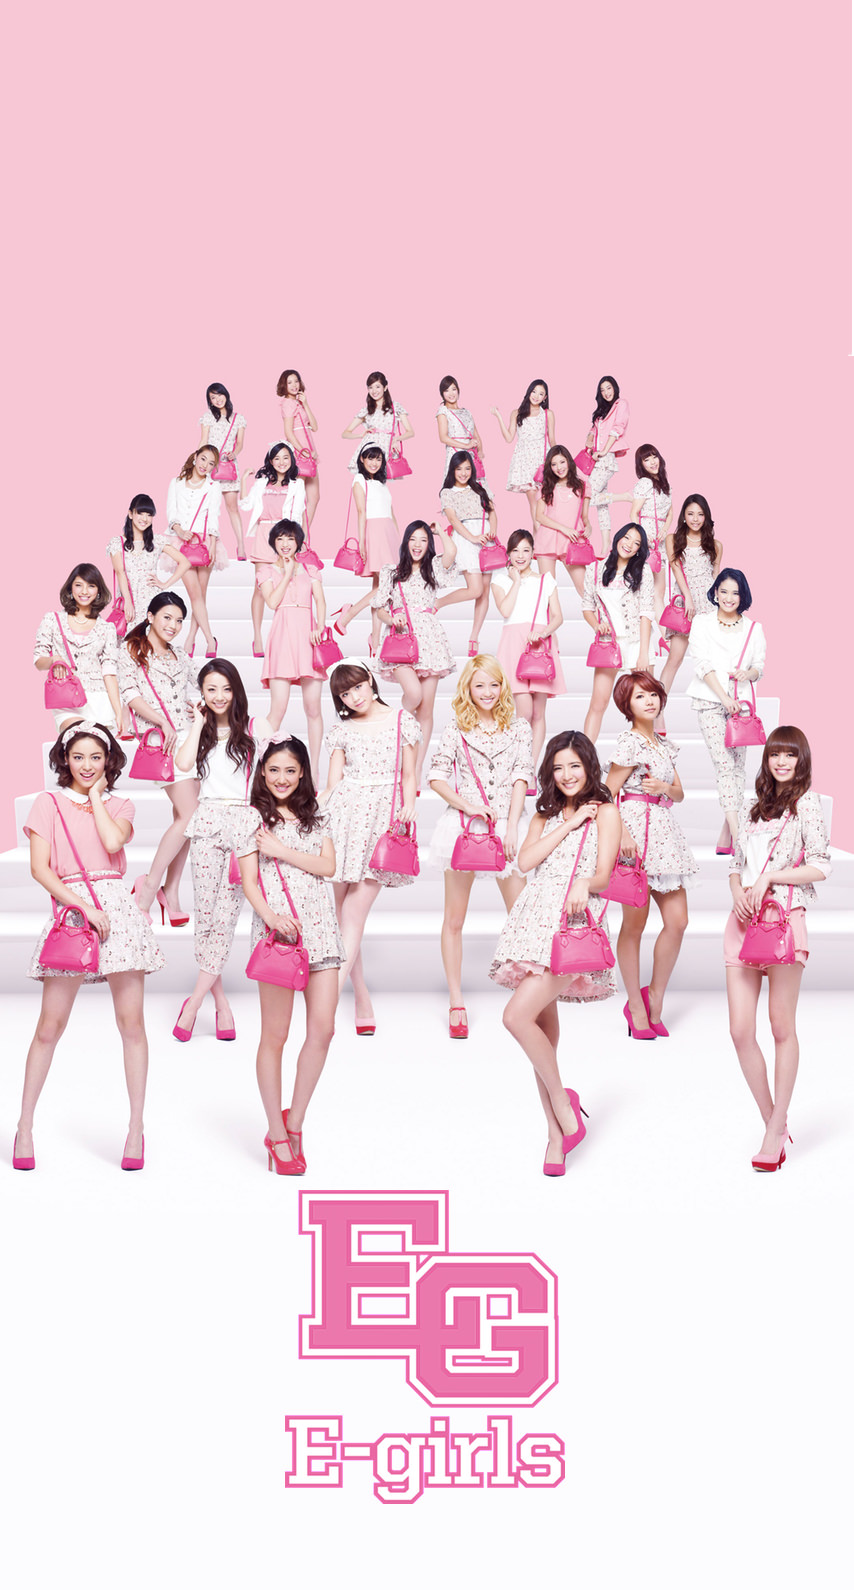 E-girlsメンバー